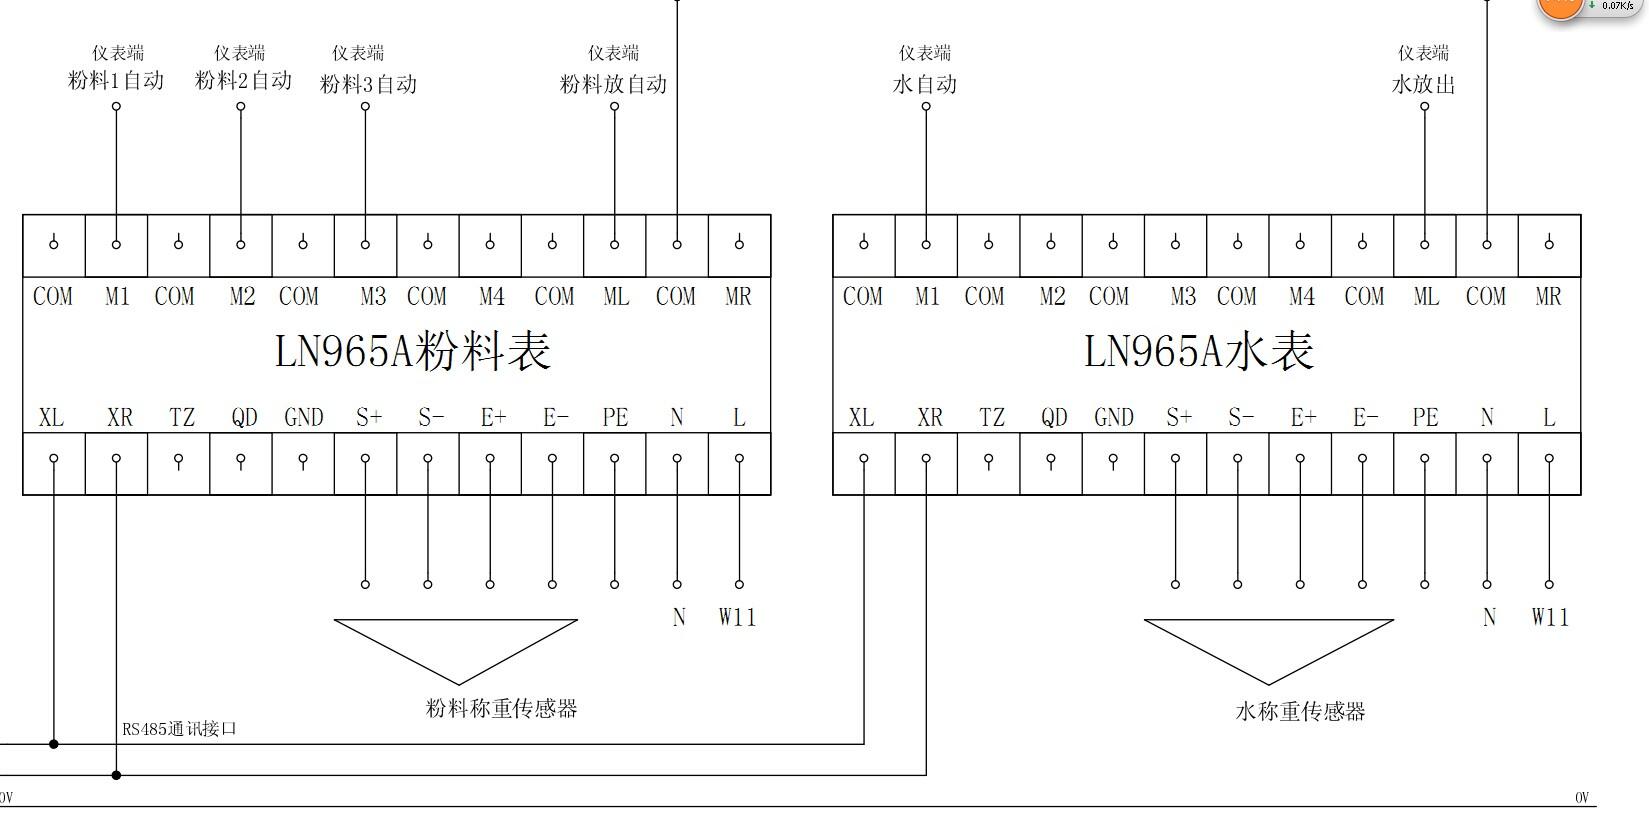 LN965A15型配料控制器LN965A15型配料控制器厂家LN965A15型配料控制器价格再干粉包装的应用产品LN965A15型配料控制器品牌效应LN965A15型配料控制器校称方法 LN965A15-J称重控制器说明书 1、简介 LN965A15-J称重控制器是专门为化工、粮食、水泥等阀口包装机提供定量后自动控制的精密智能仪器。它具有操作简单、校准方便、性能稳定、双阀门、高精度等特点,它采用双面板设计,具有良好的抗干扰能力,能在复杂、恶劣的环境中可靠使用。